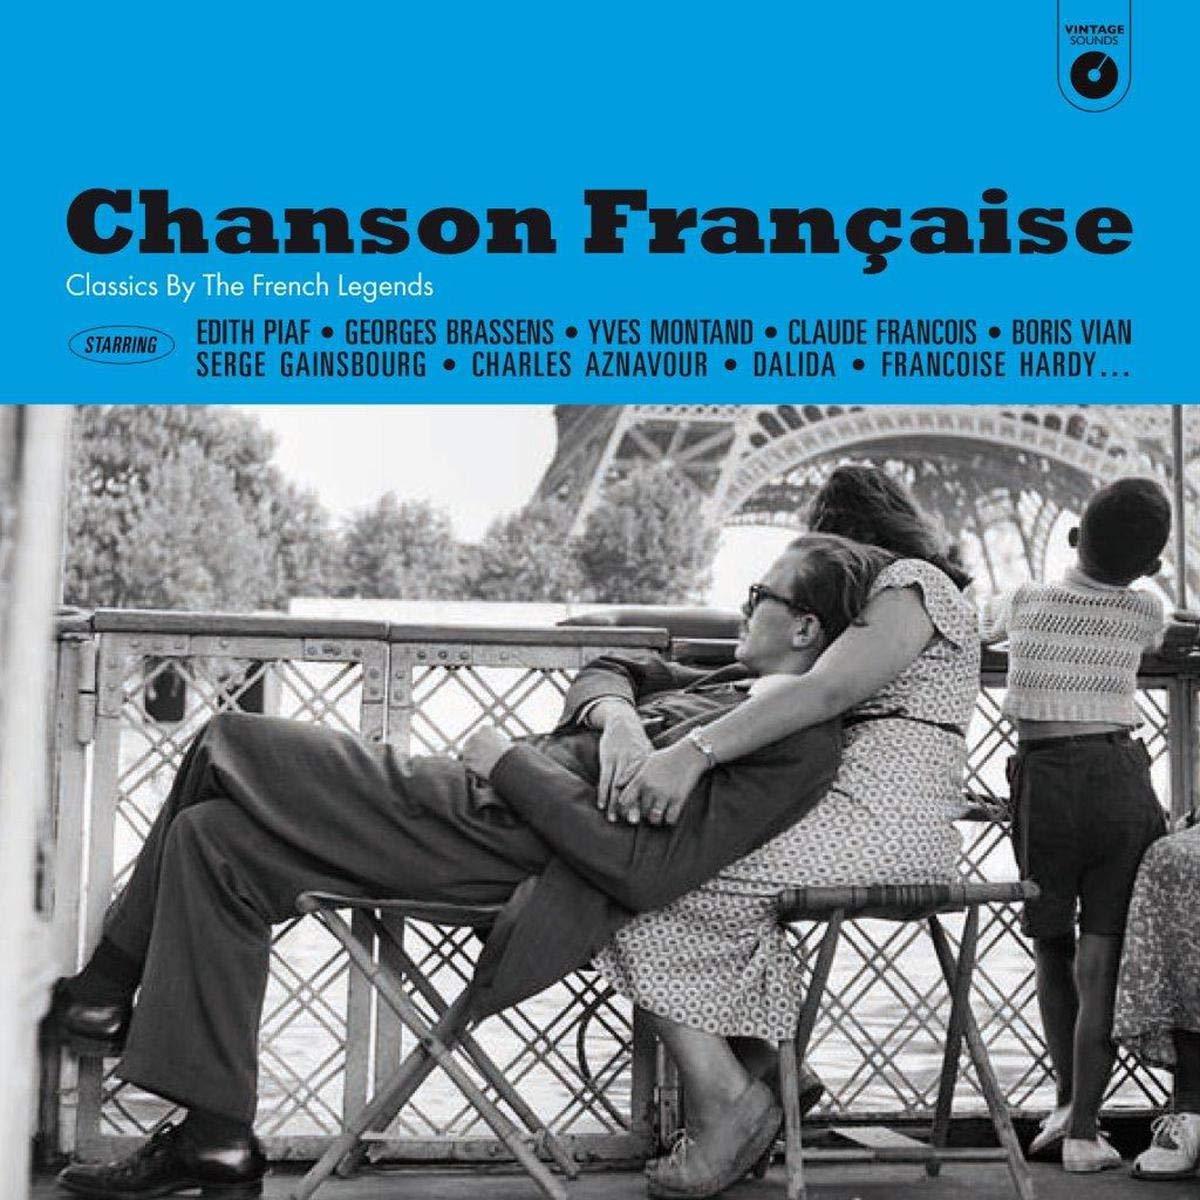 Chanson Francaise - Vinyl